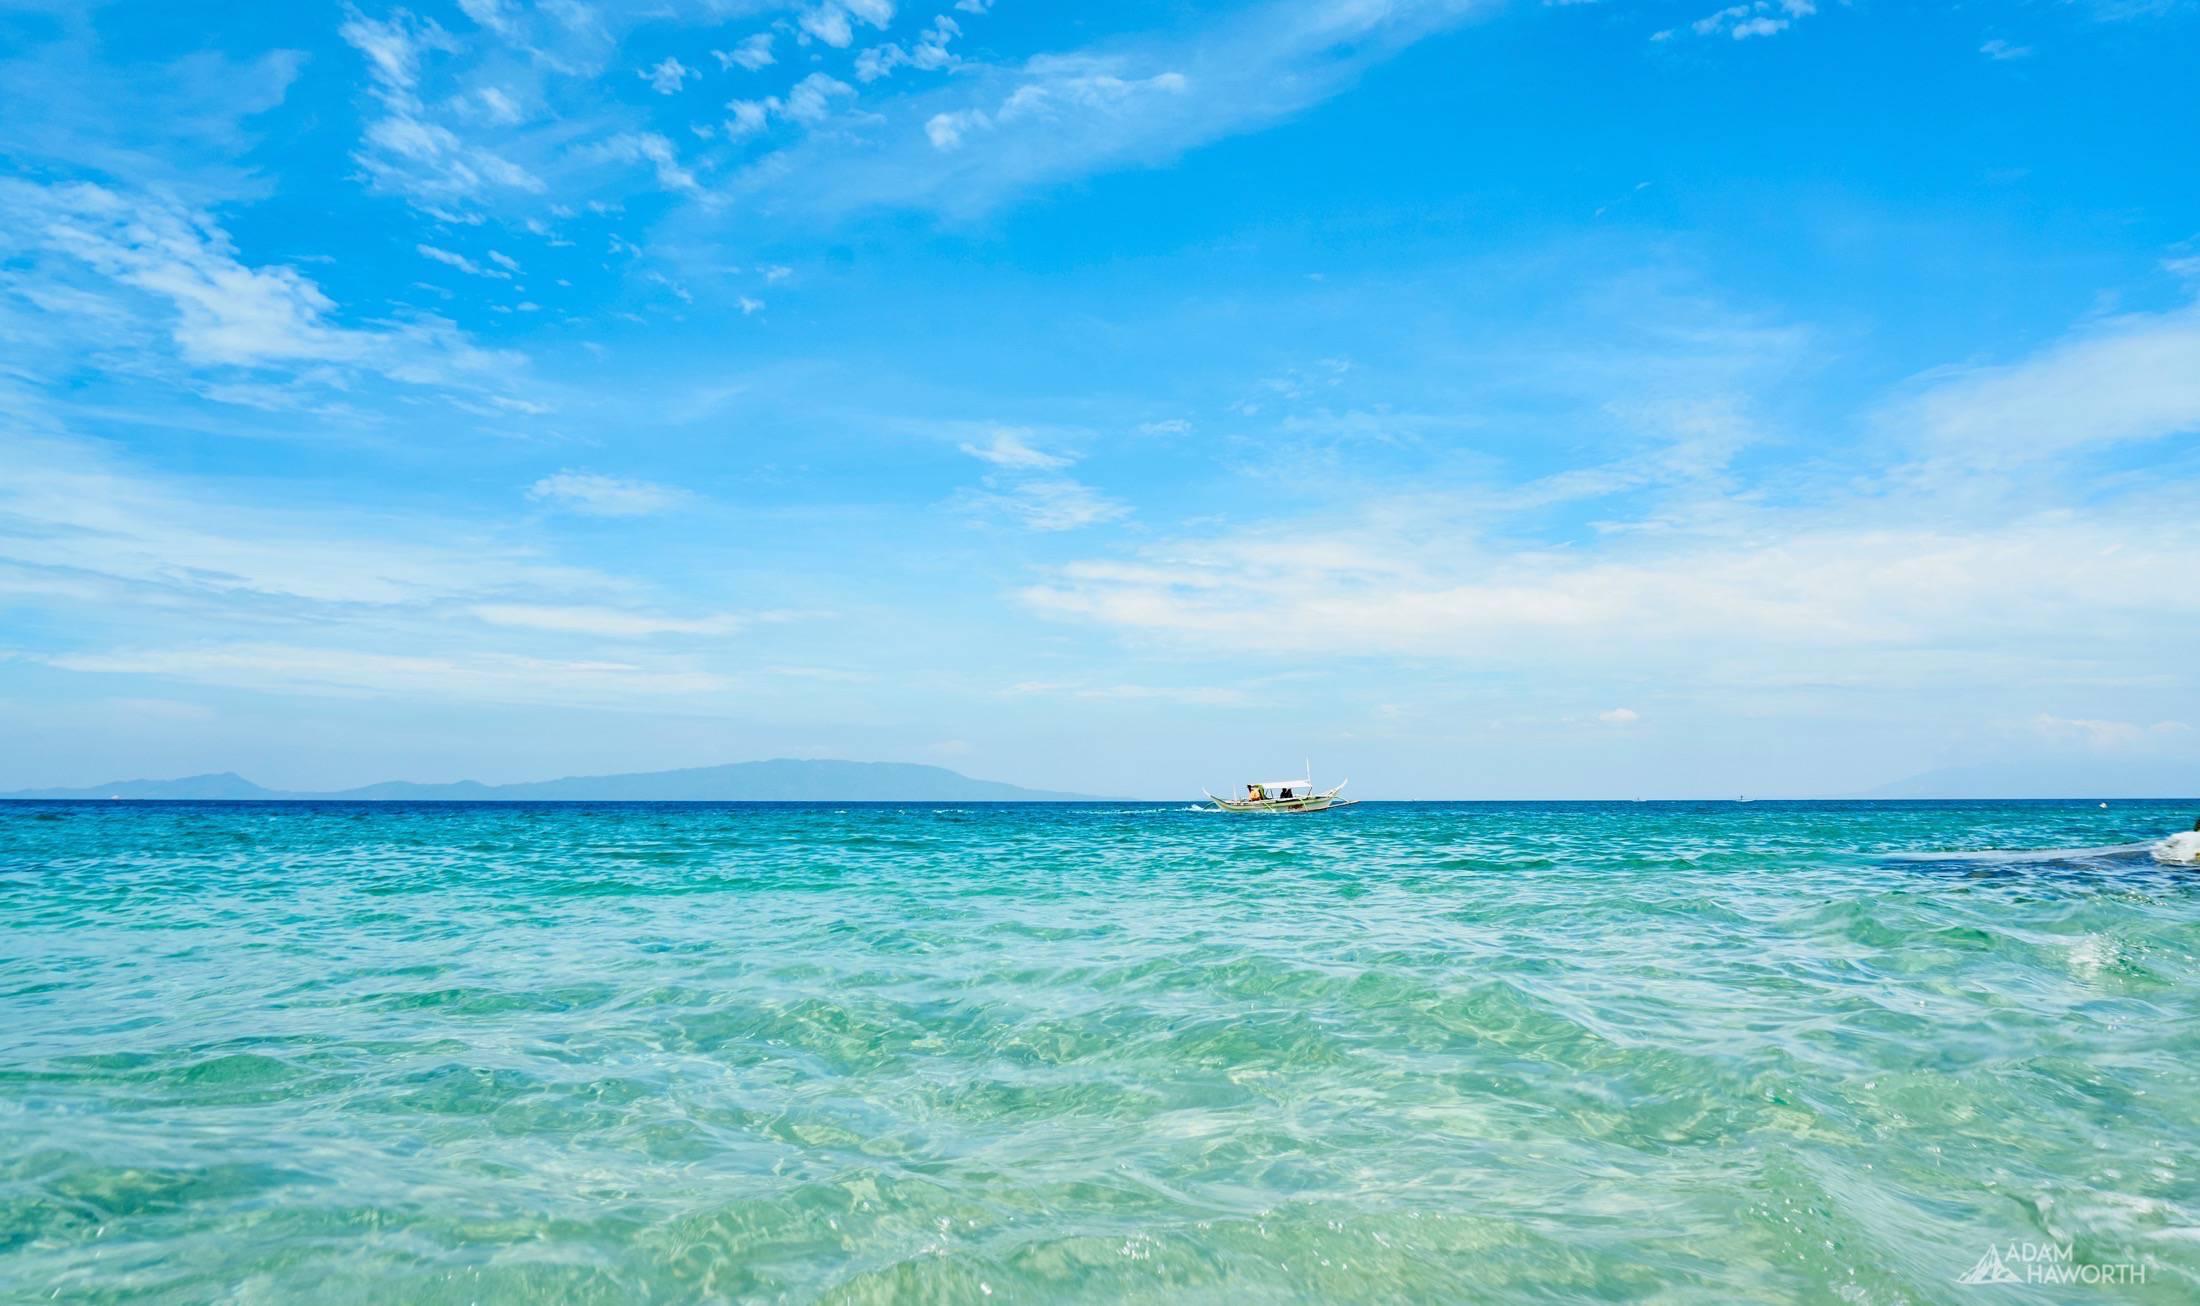 Puerto Galera, Philippines - Photography by Adam Haworth